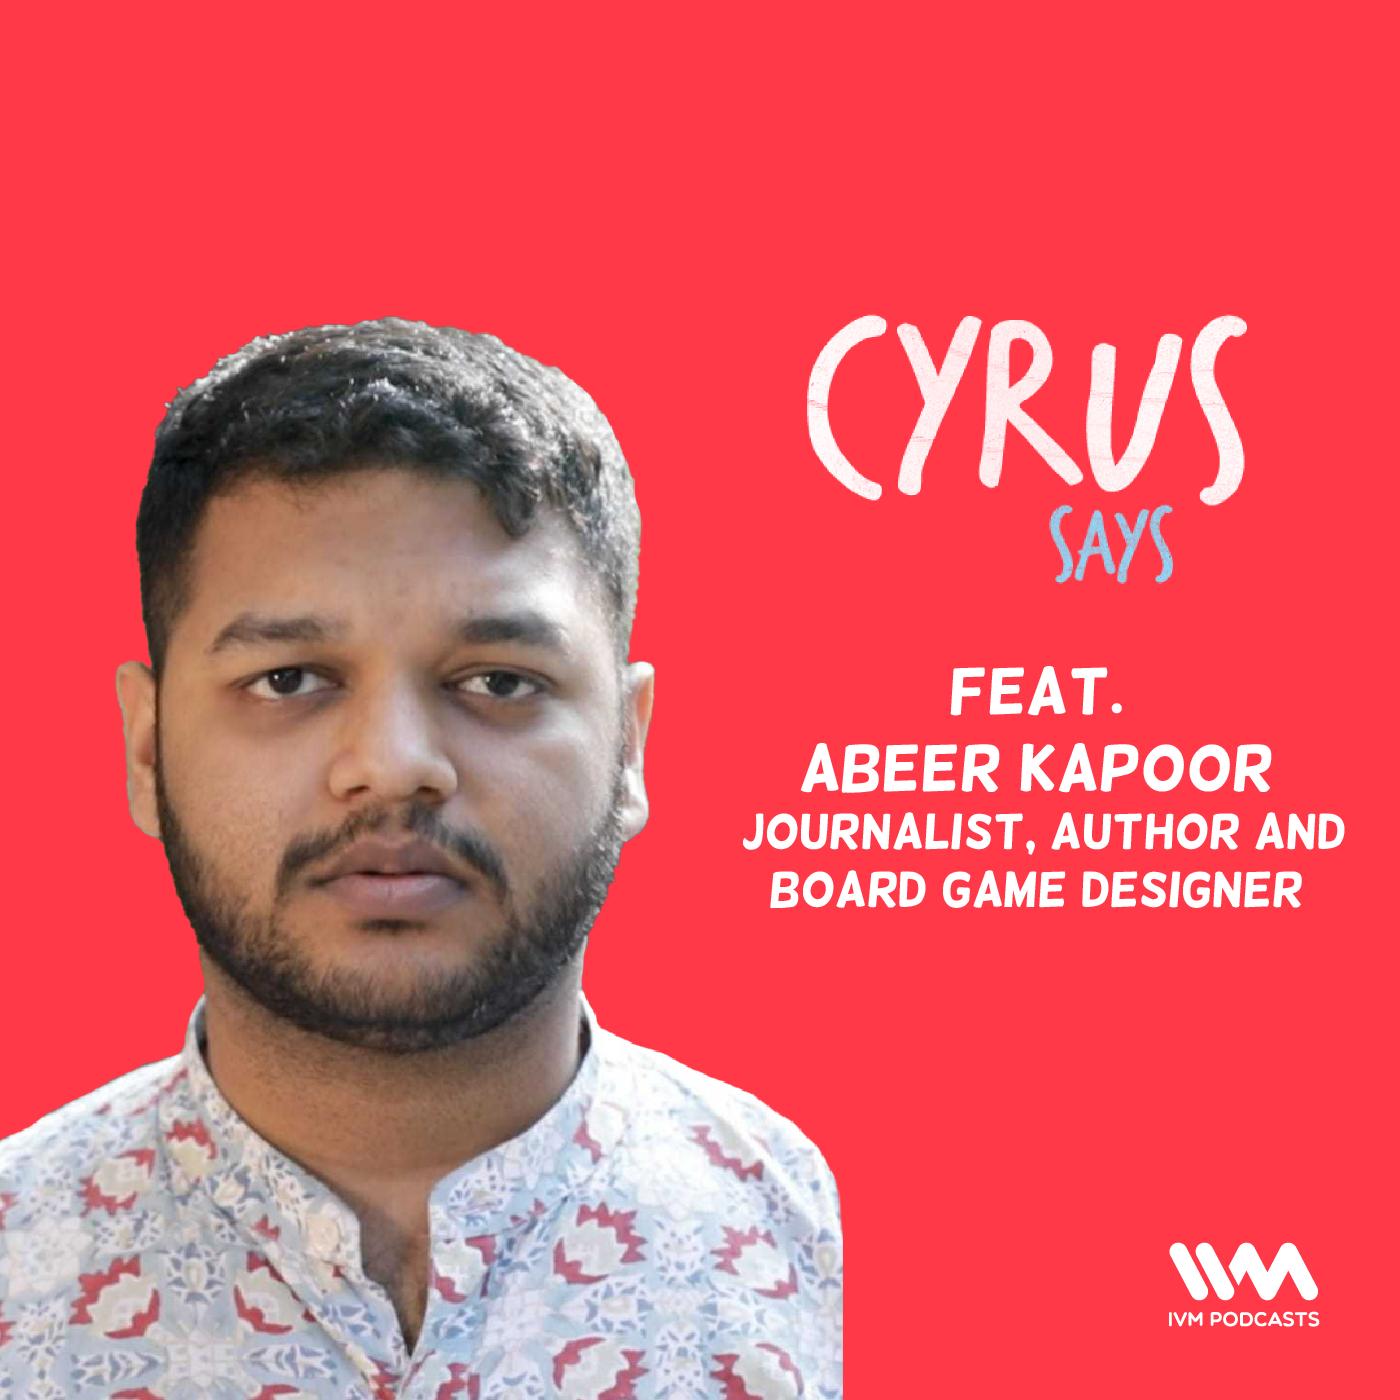 Ep. 604: feat. Abeer Kapoor, Amit and Antariksh